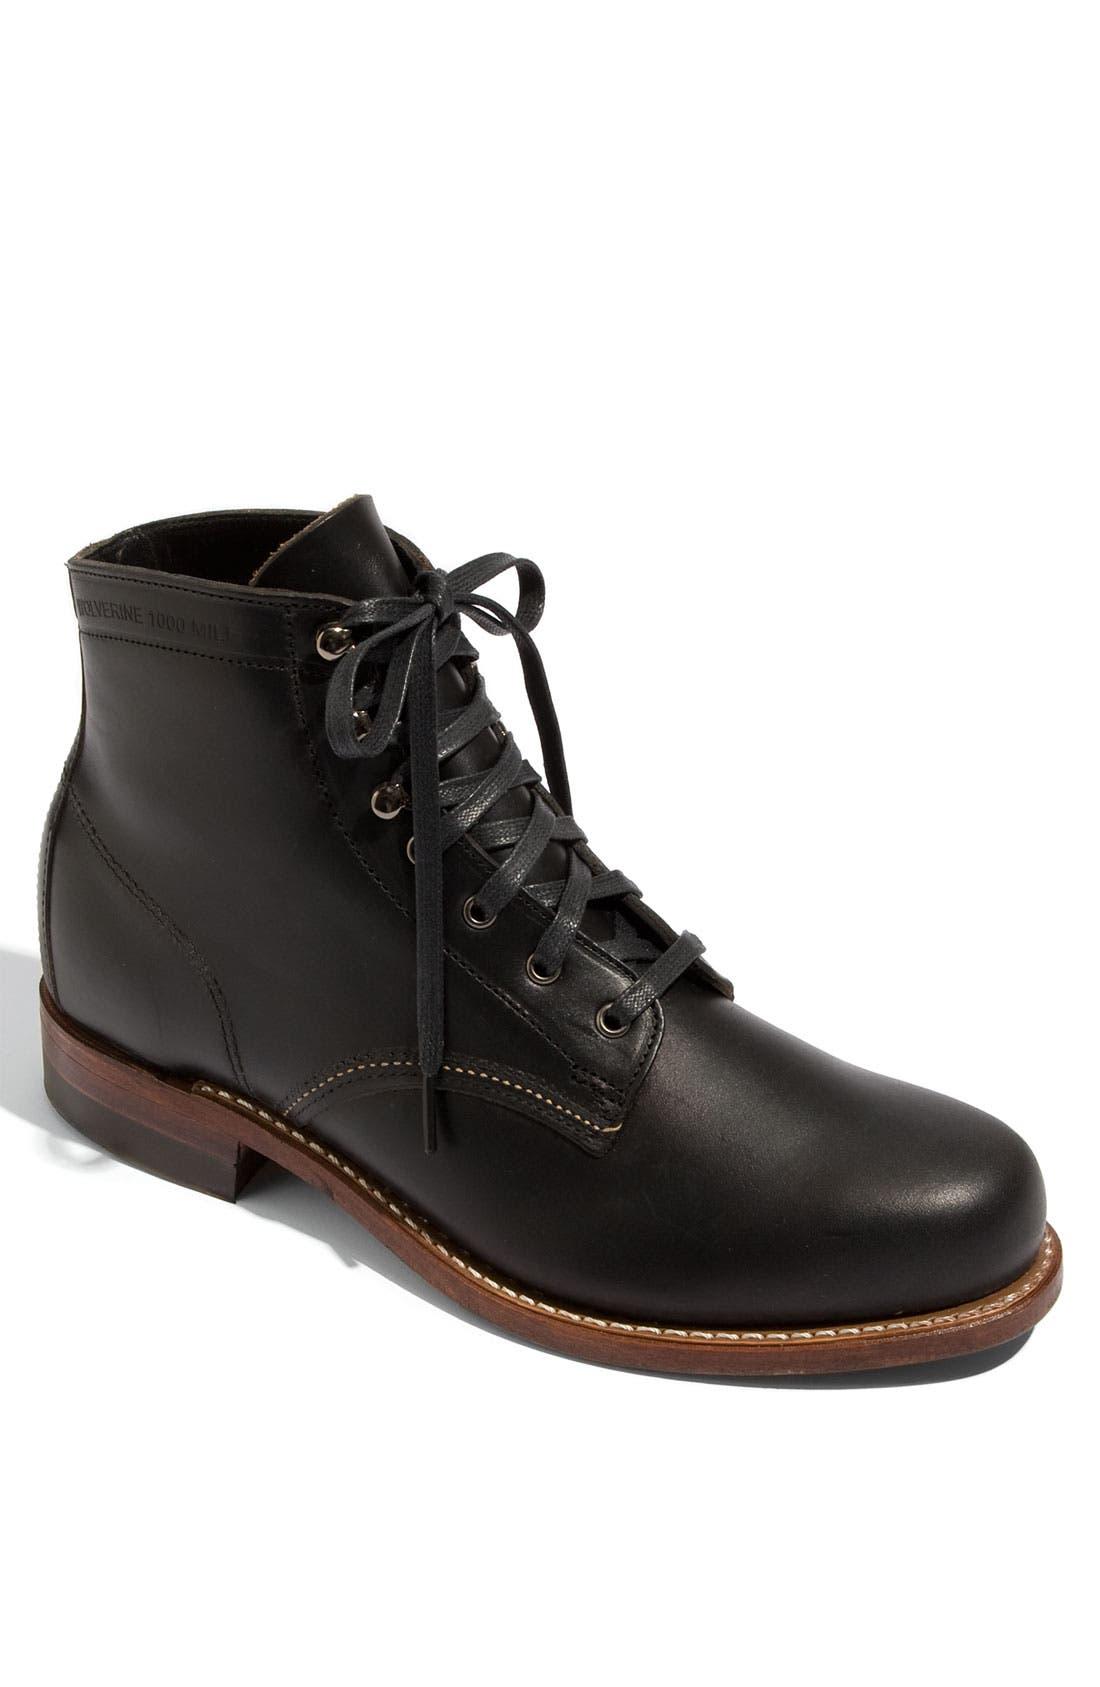 WOLVERINE Courtland 1000 Mile Boot, Black